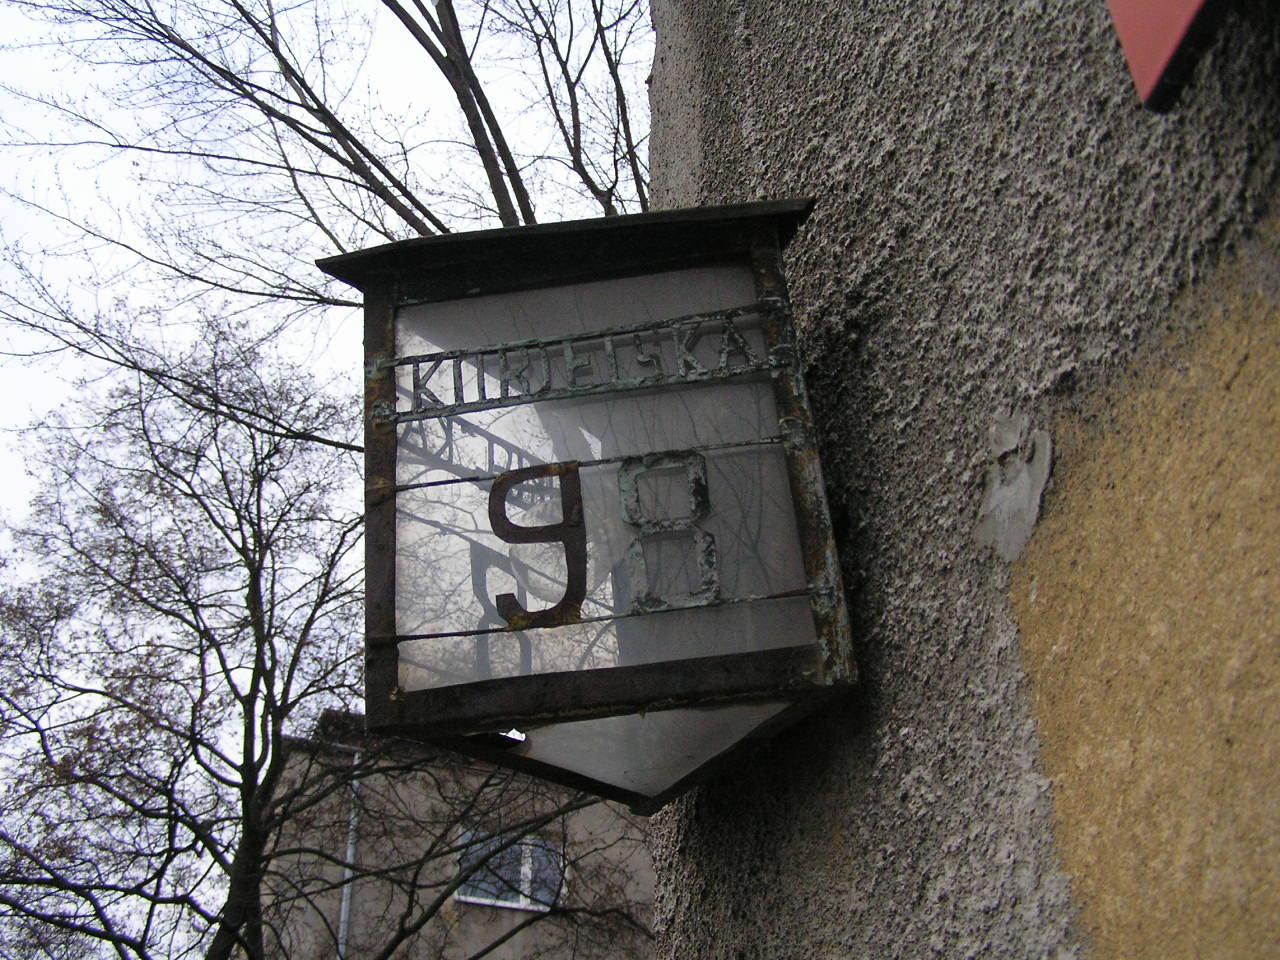 Latarenka adresowa - Kobielska 98